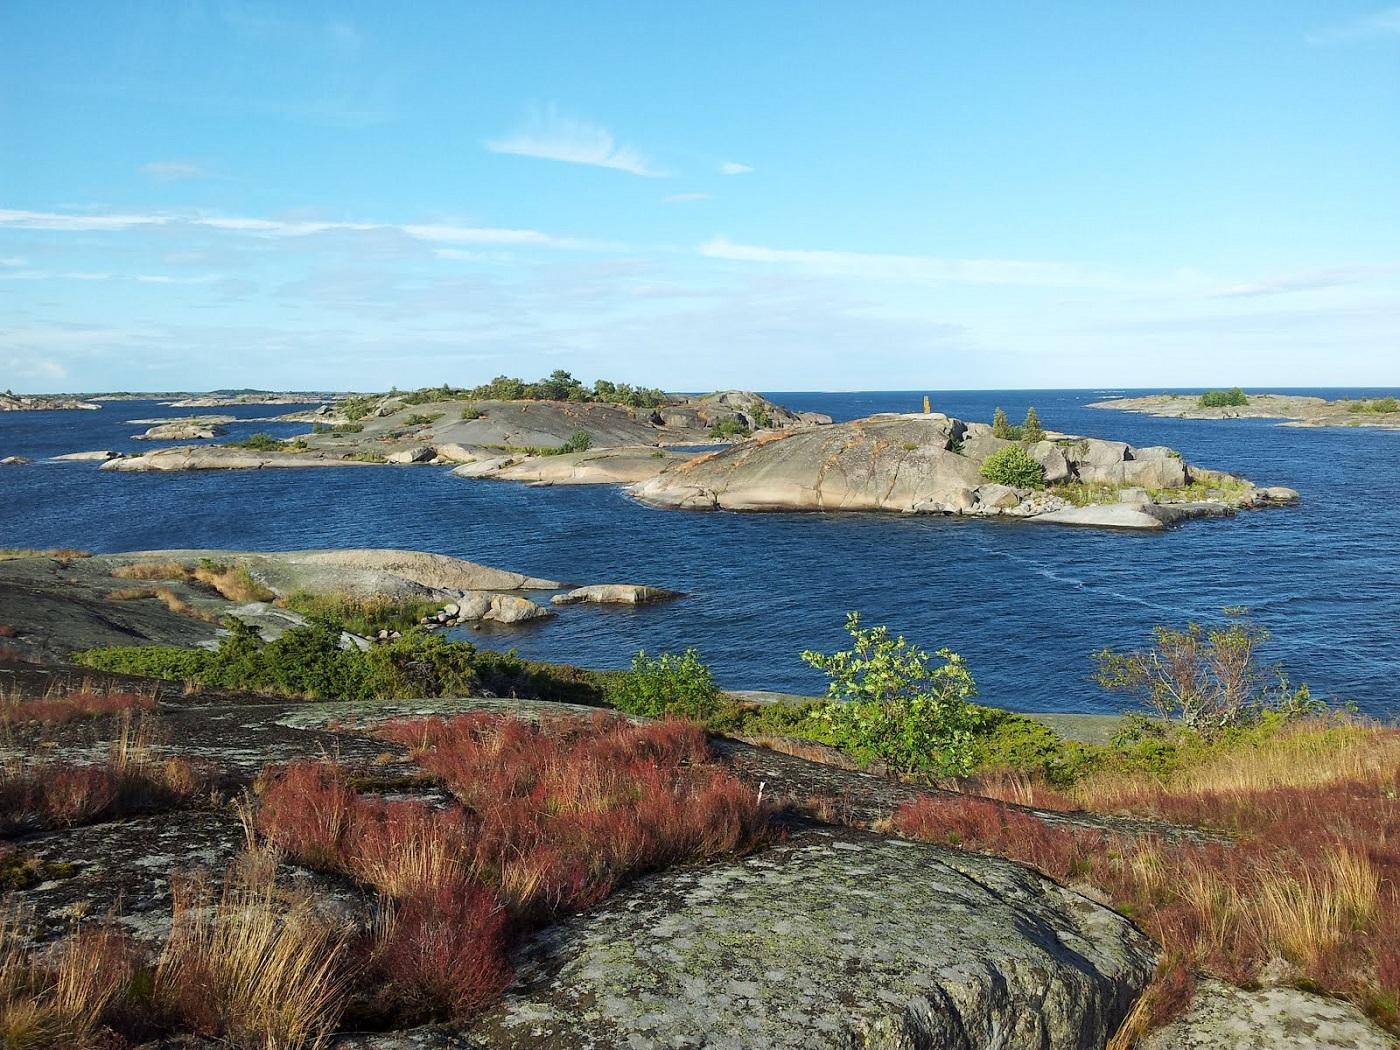 Peisajele superbe fac din Arhipelagul Stockholm un loc unic!